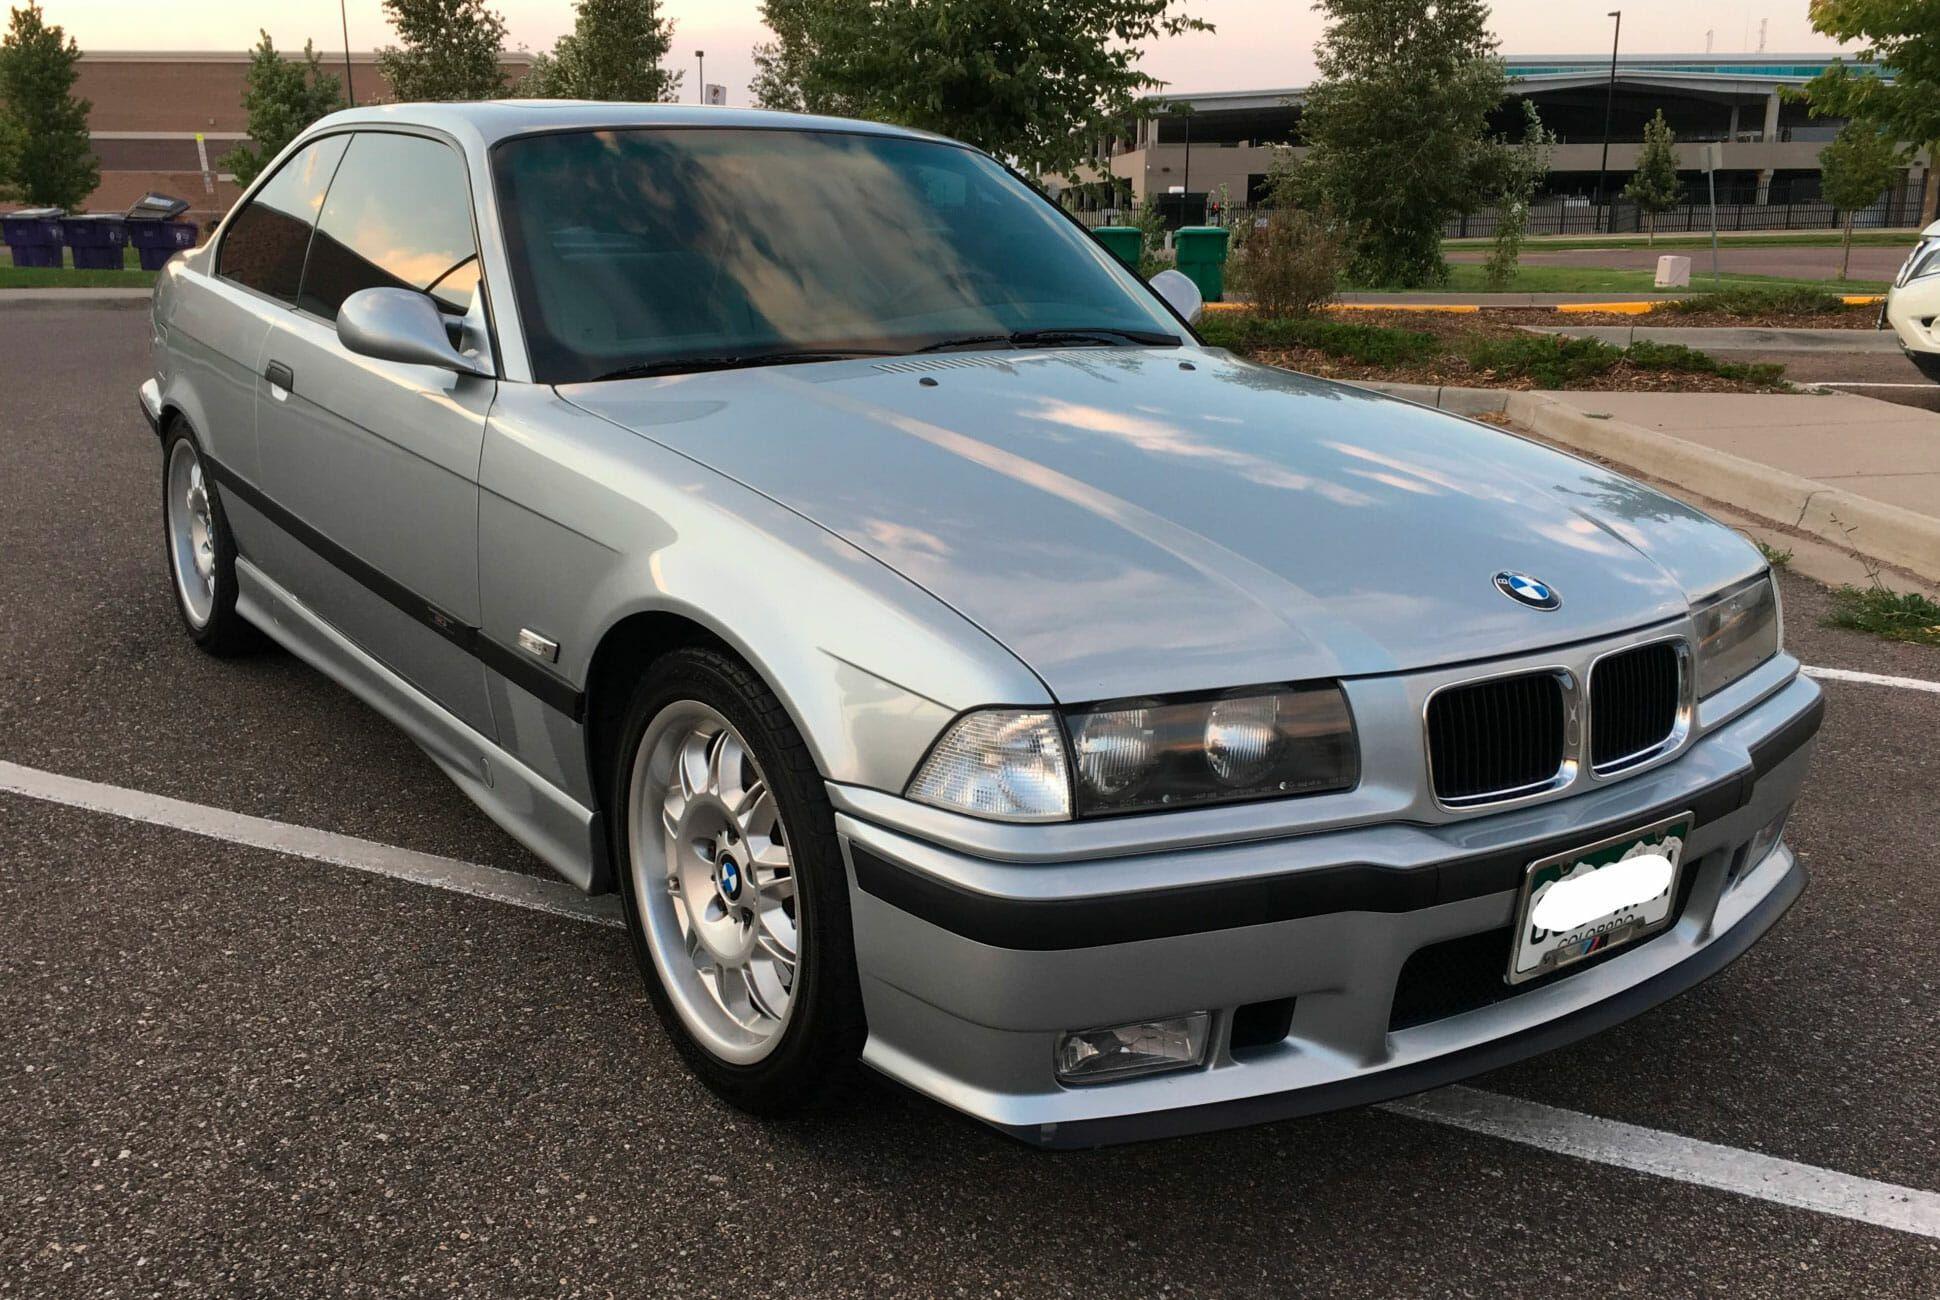 1996-BMW-M3-Coupe-5-Speed-gear-patrol-slide-02